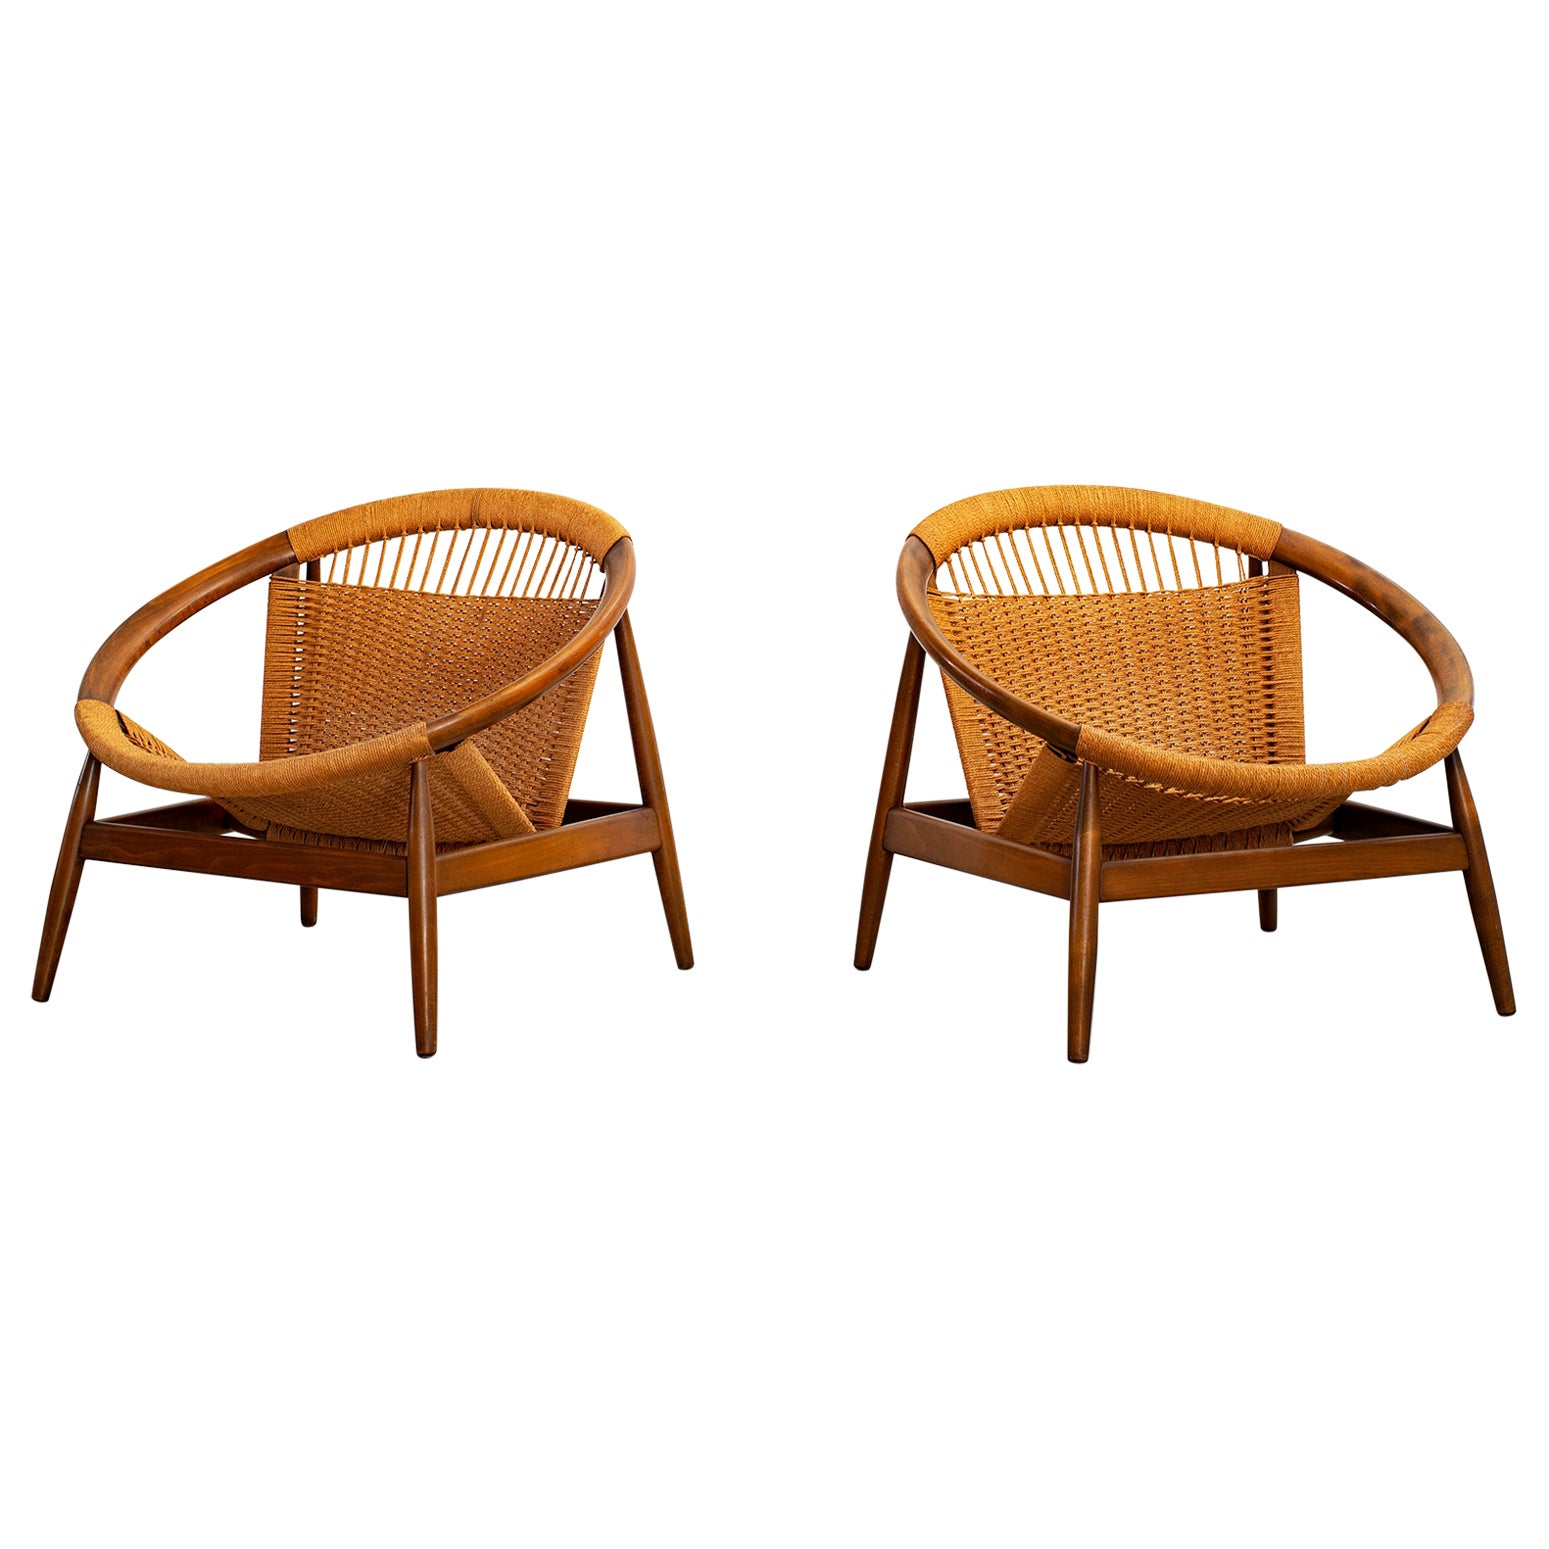 "Illum Wikkelso ""Ringstol"" Lounge Chairs"